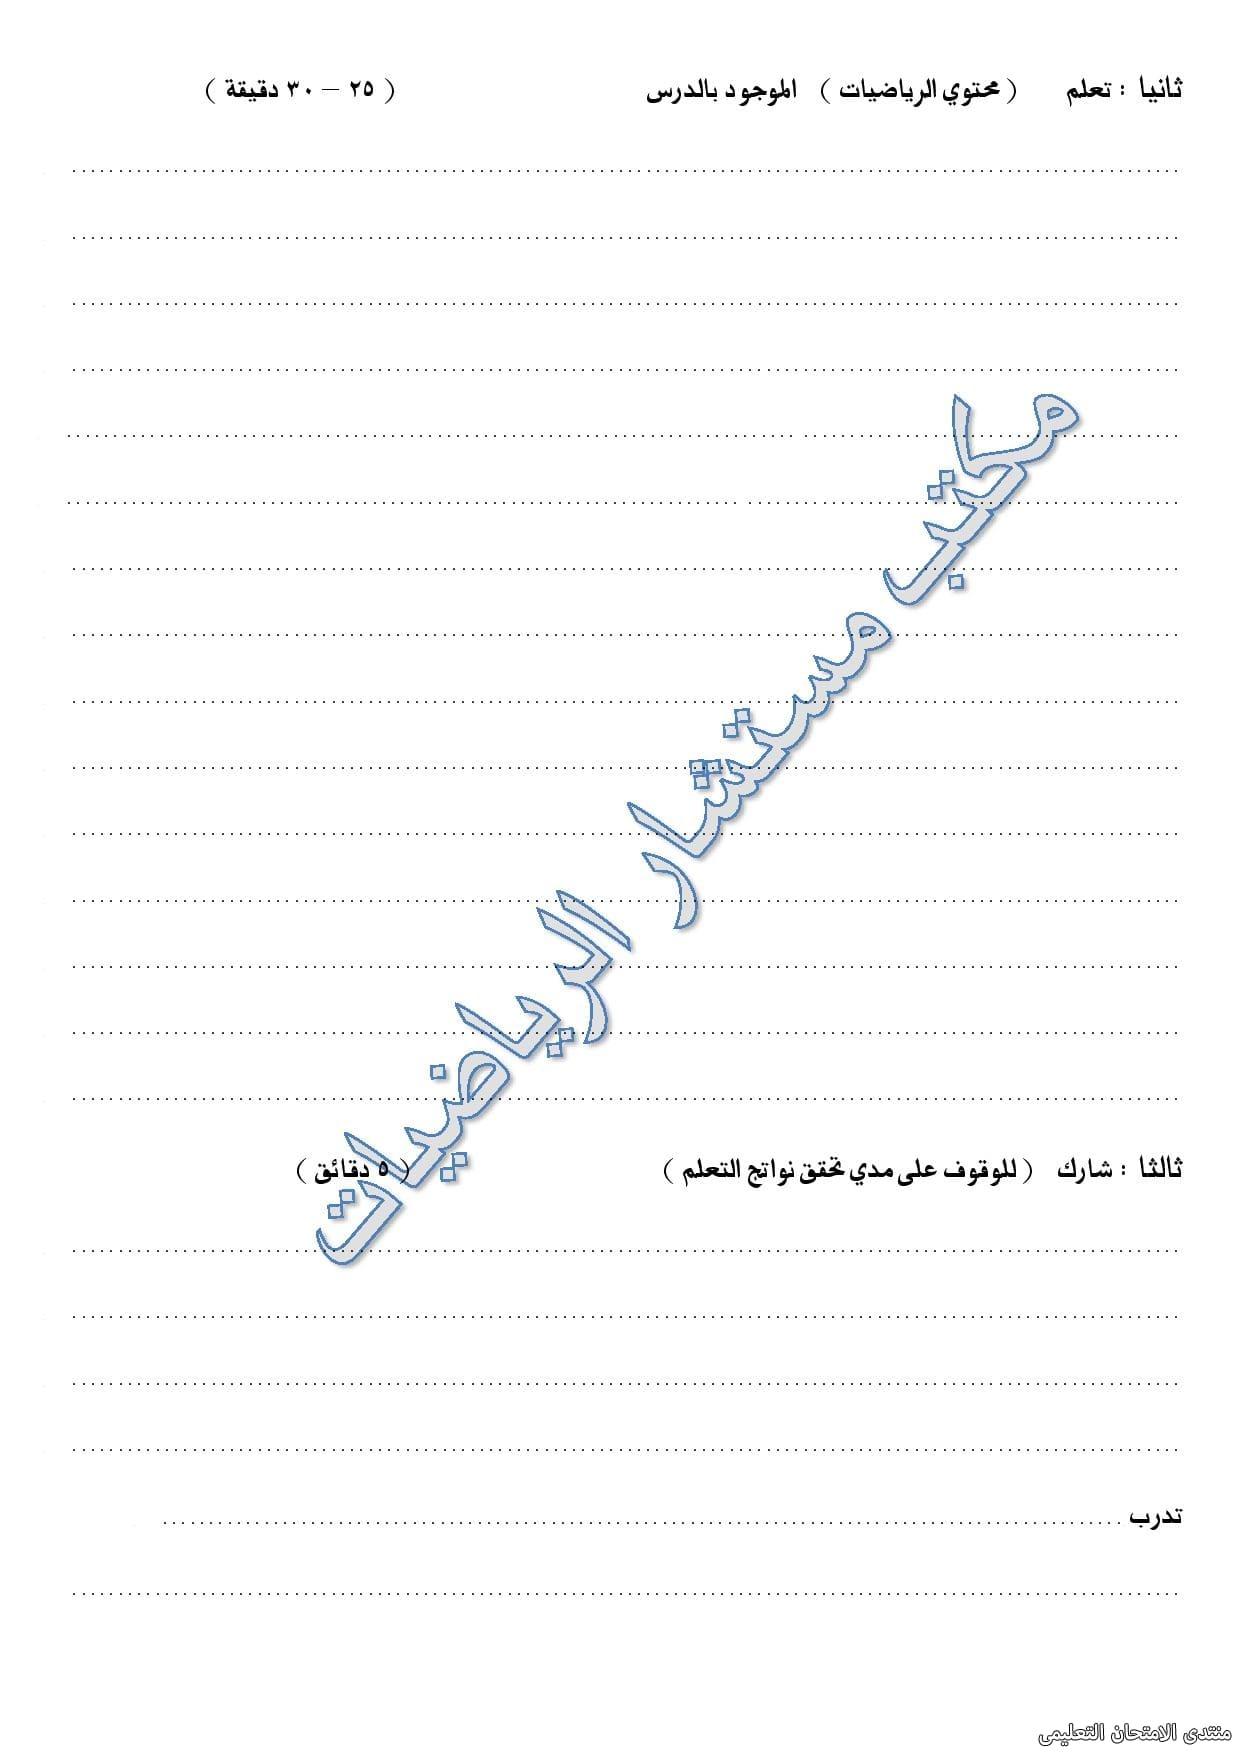 exam-eg.com_157221707379833.jpg